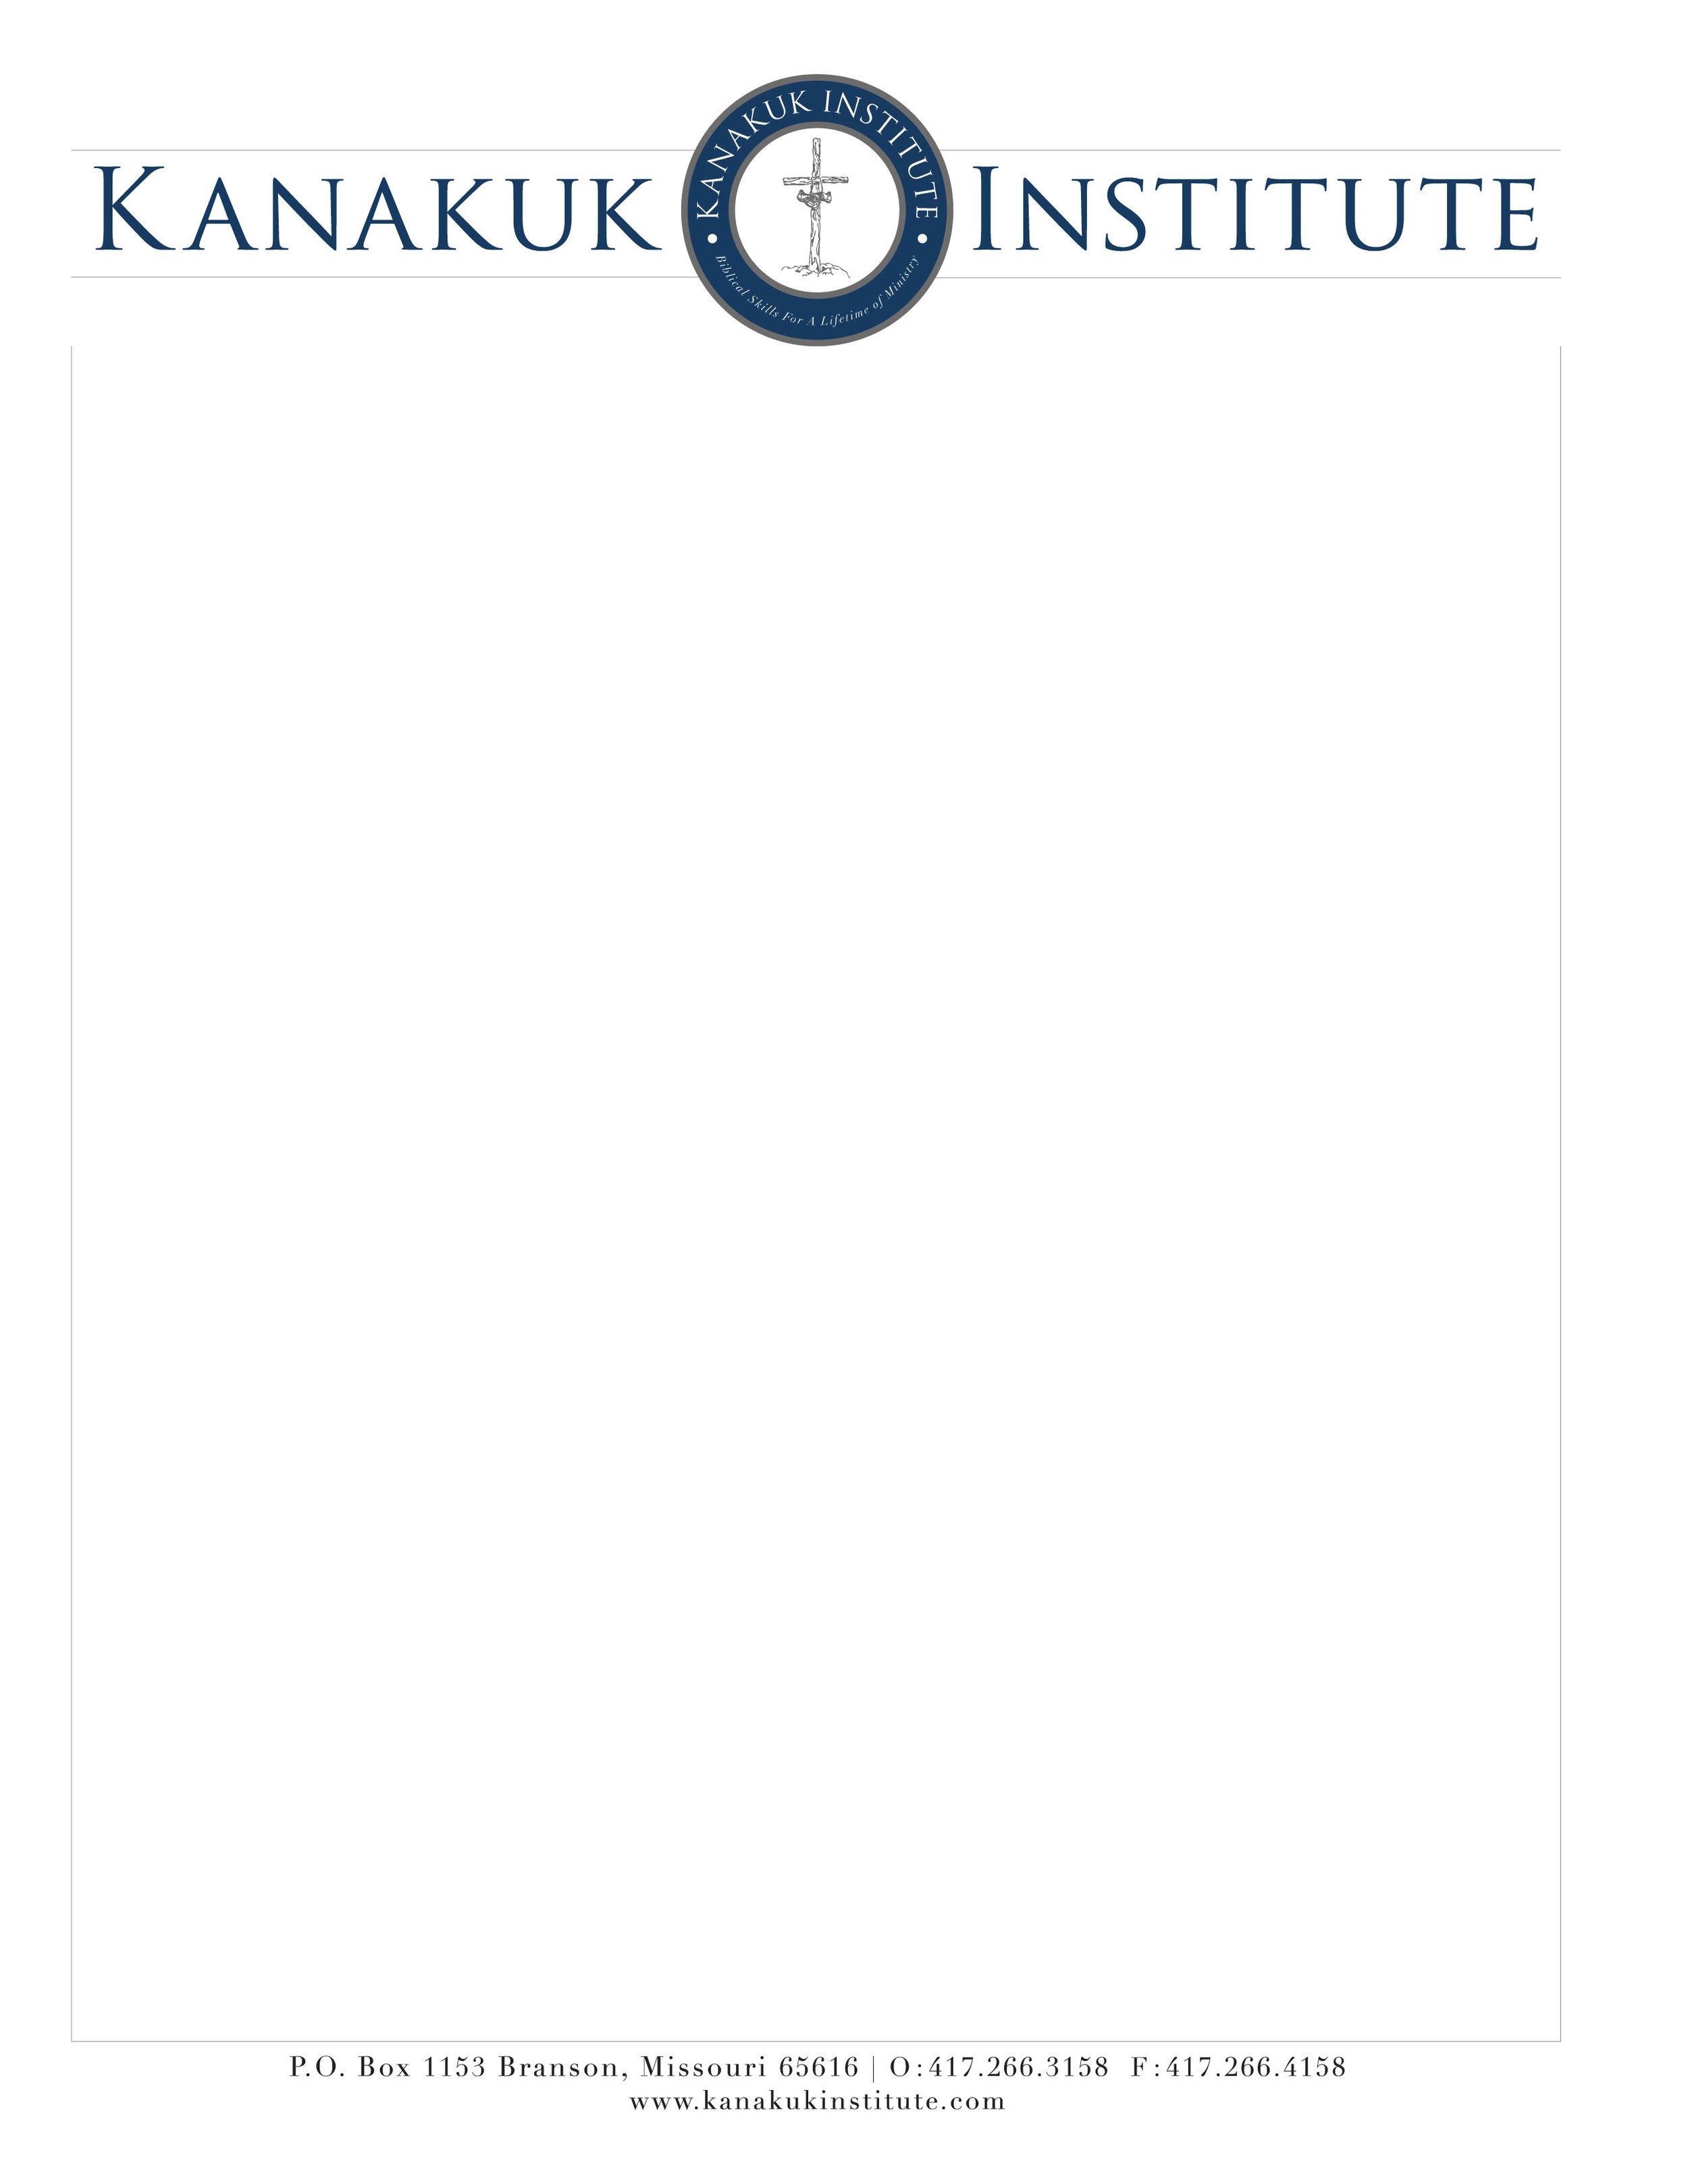 letterhead design and type treatment using new logo